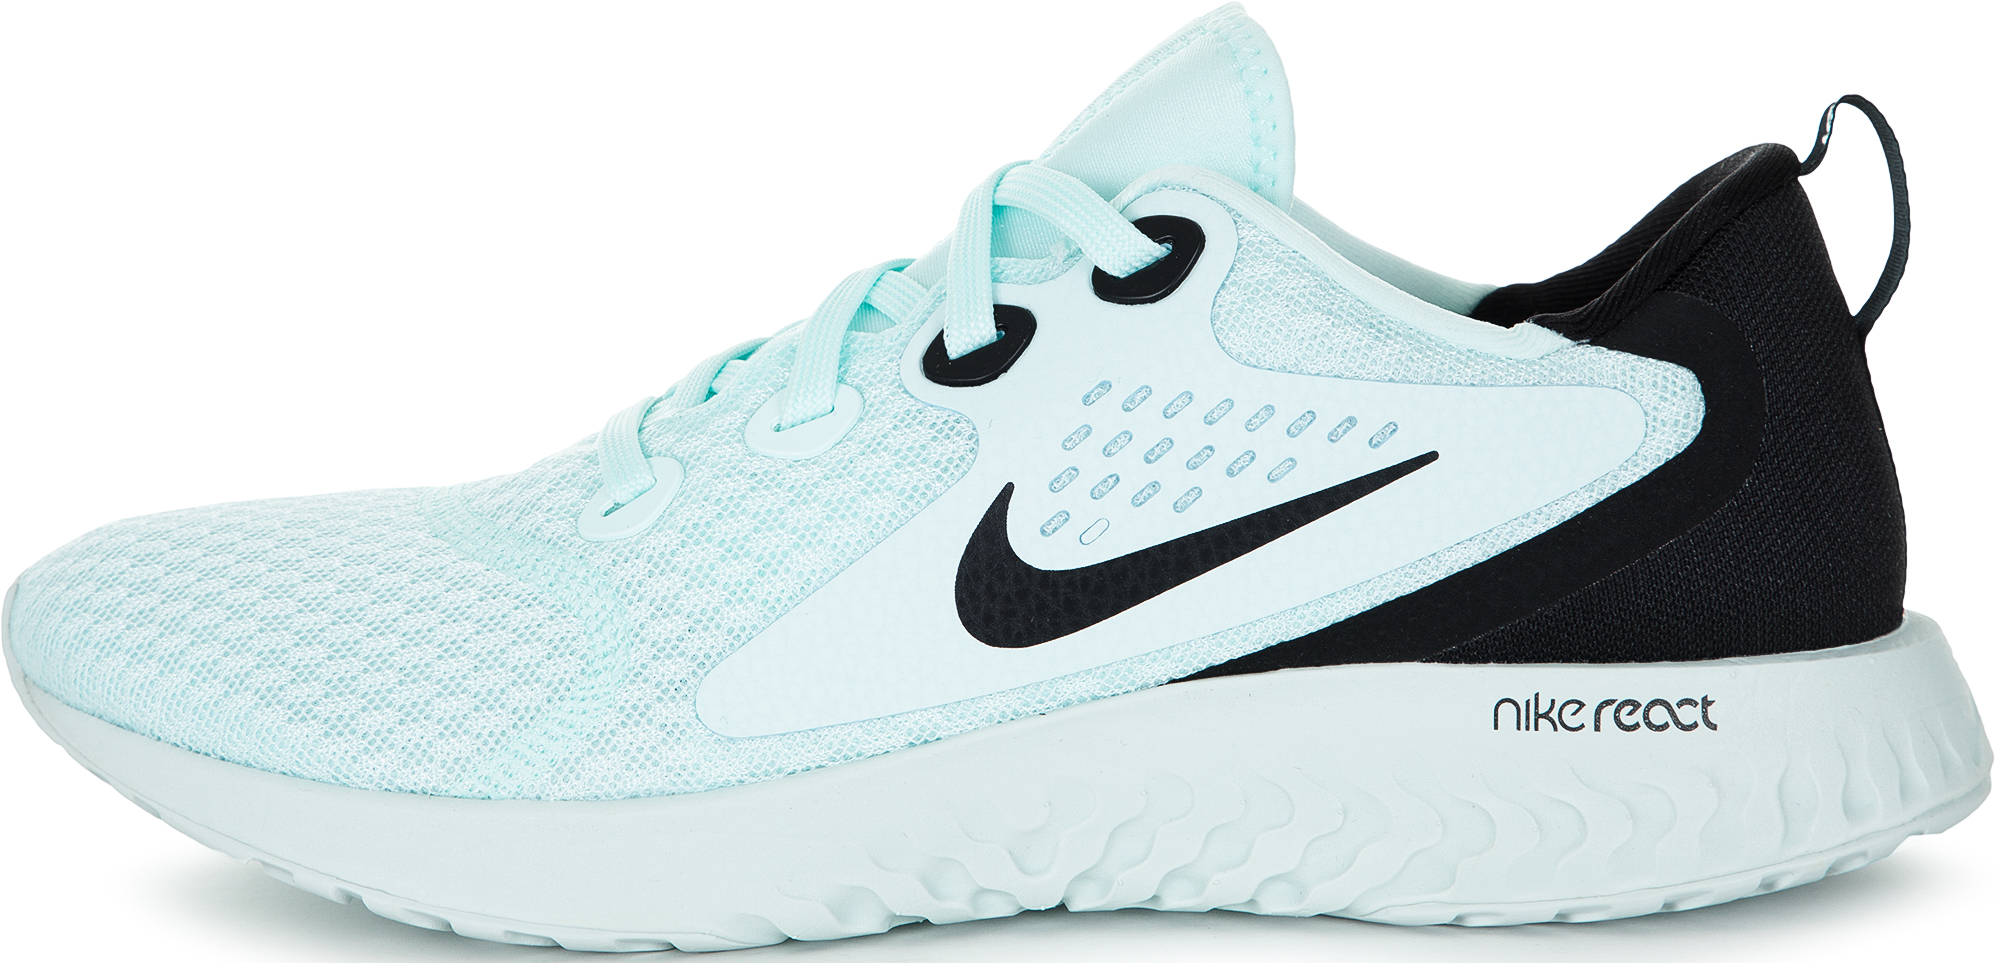 Nike Кроссовки женские Nike Legend React, размер 38